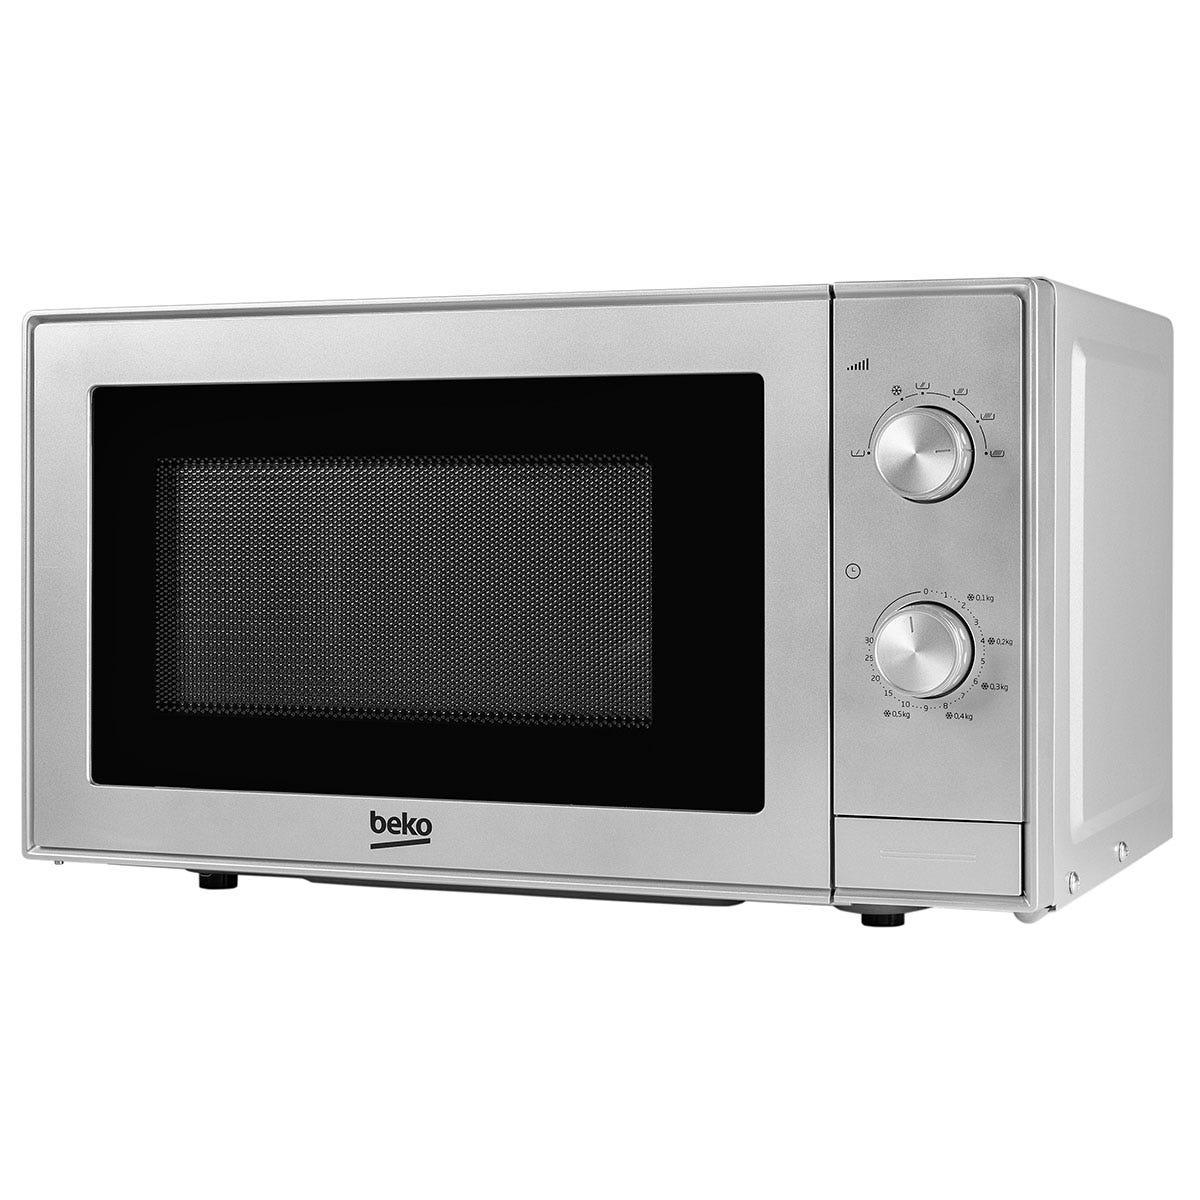 Beko MOC20100S 45cm Compact Microwave - Silver